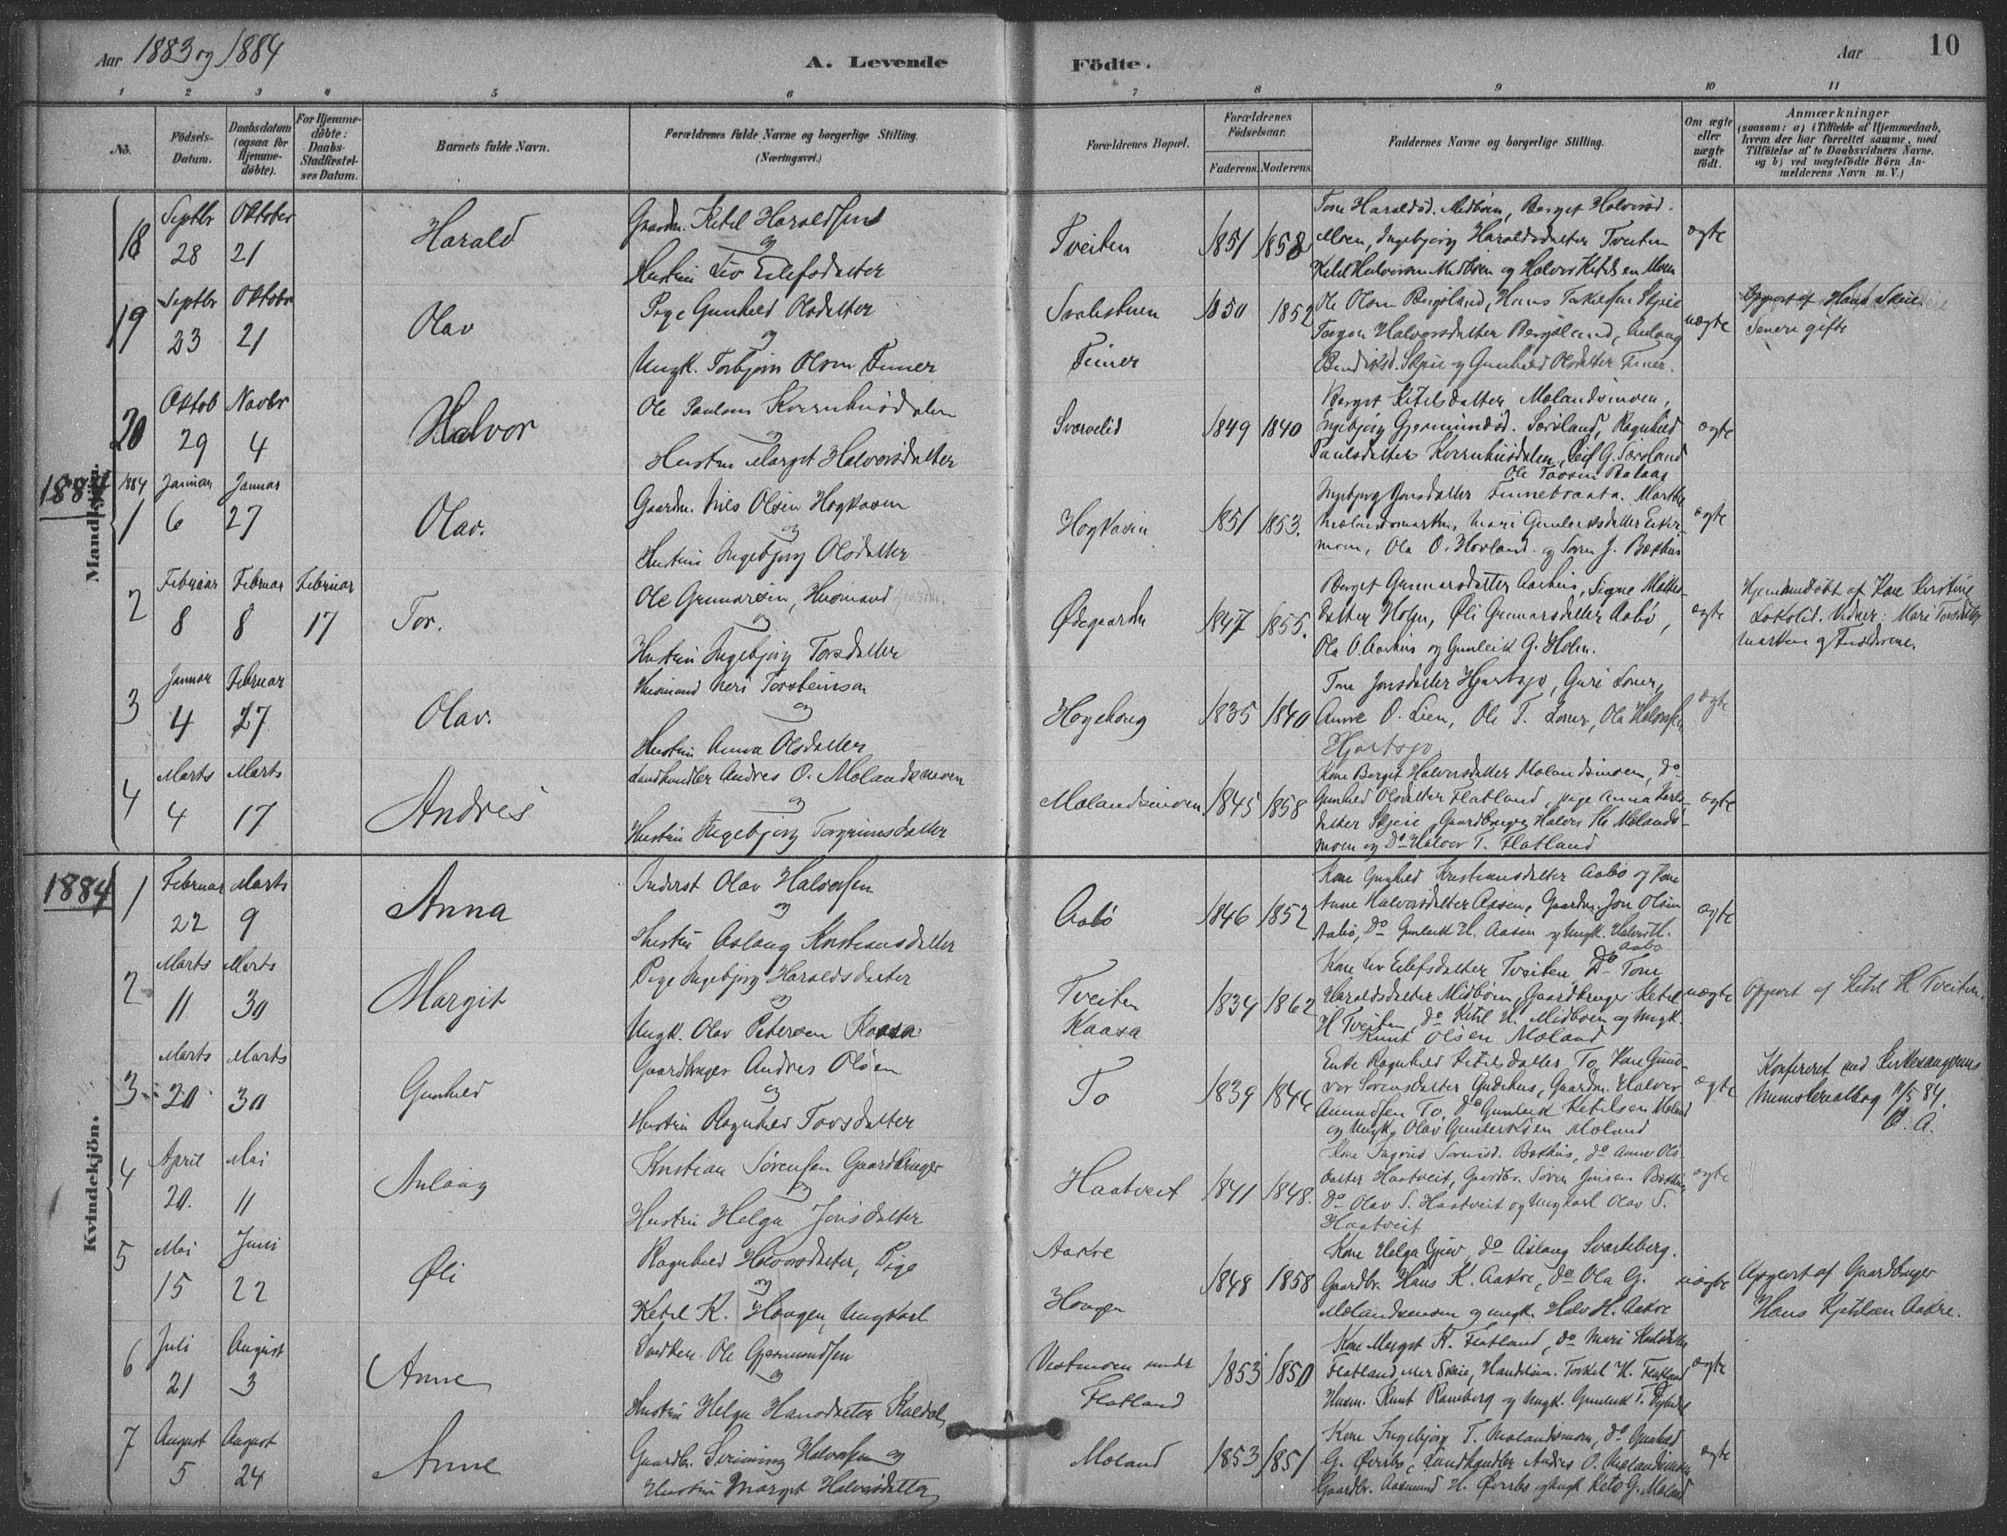 SAKO, Hjartdal kirkebøker, F/Fa/L0010: Ministerialbok nr. I 10, 1880-1929, s. 10